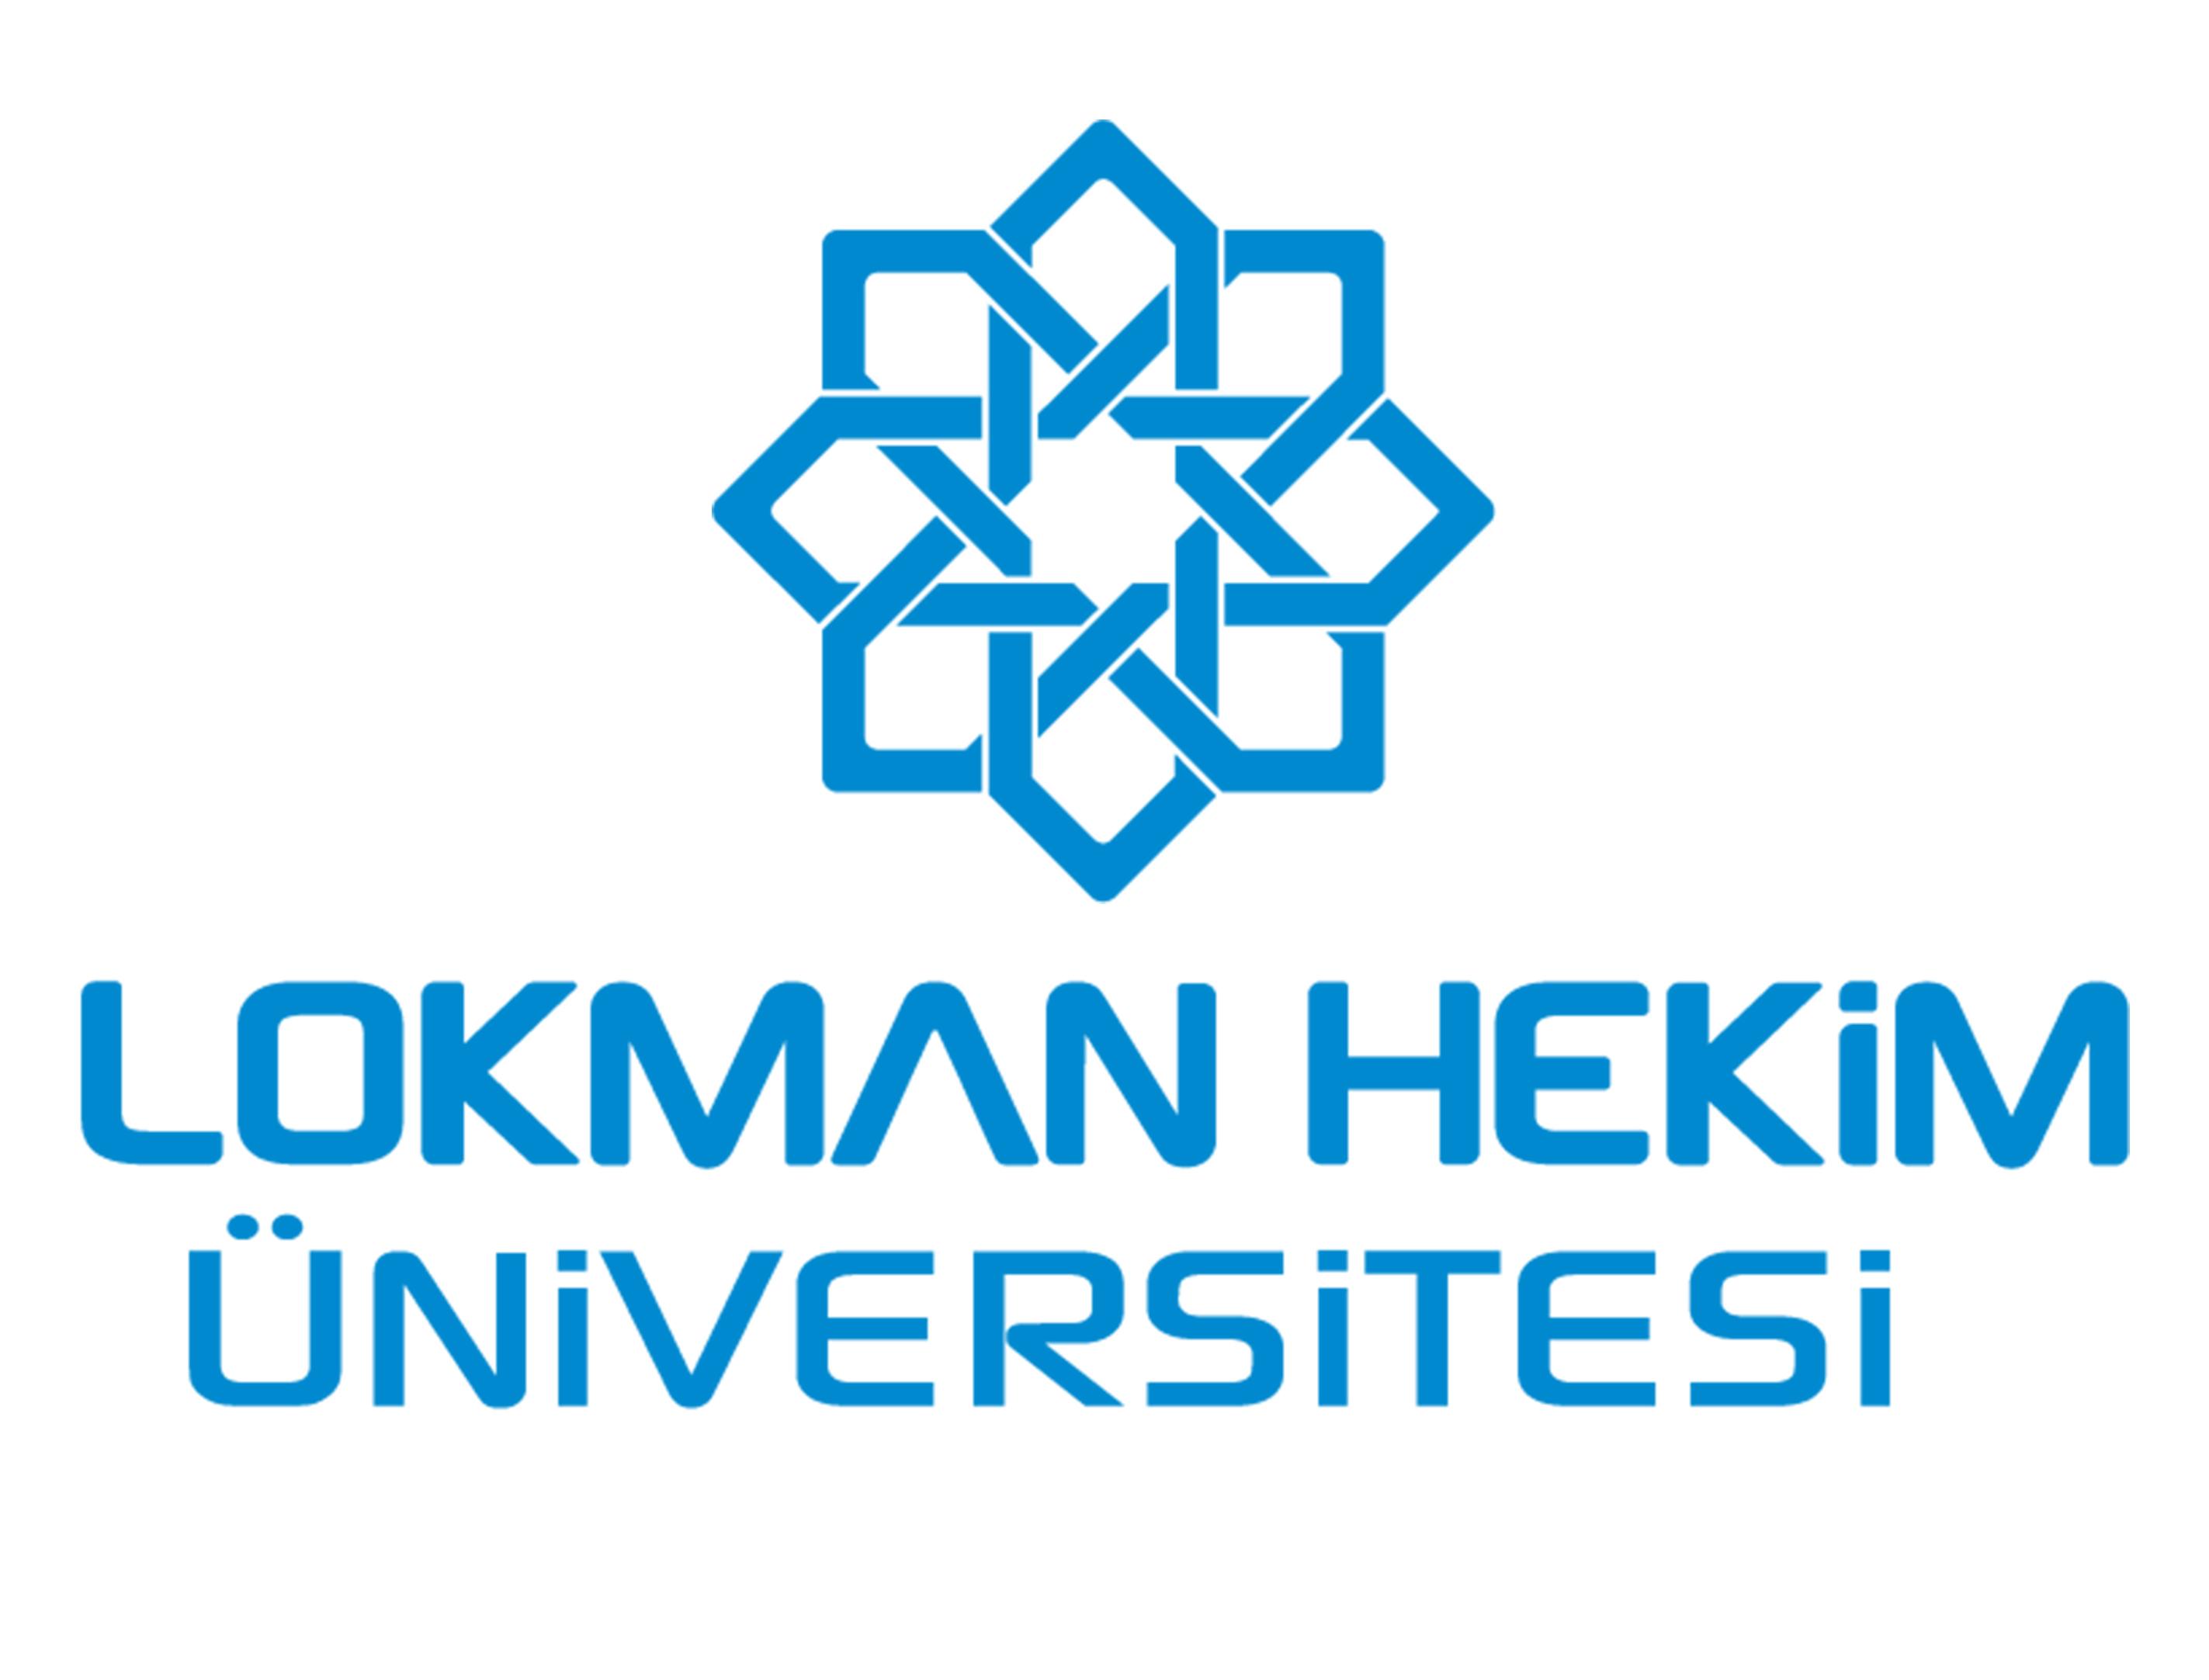 LOKMAN HEKIM UNIVERSITY